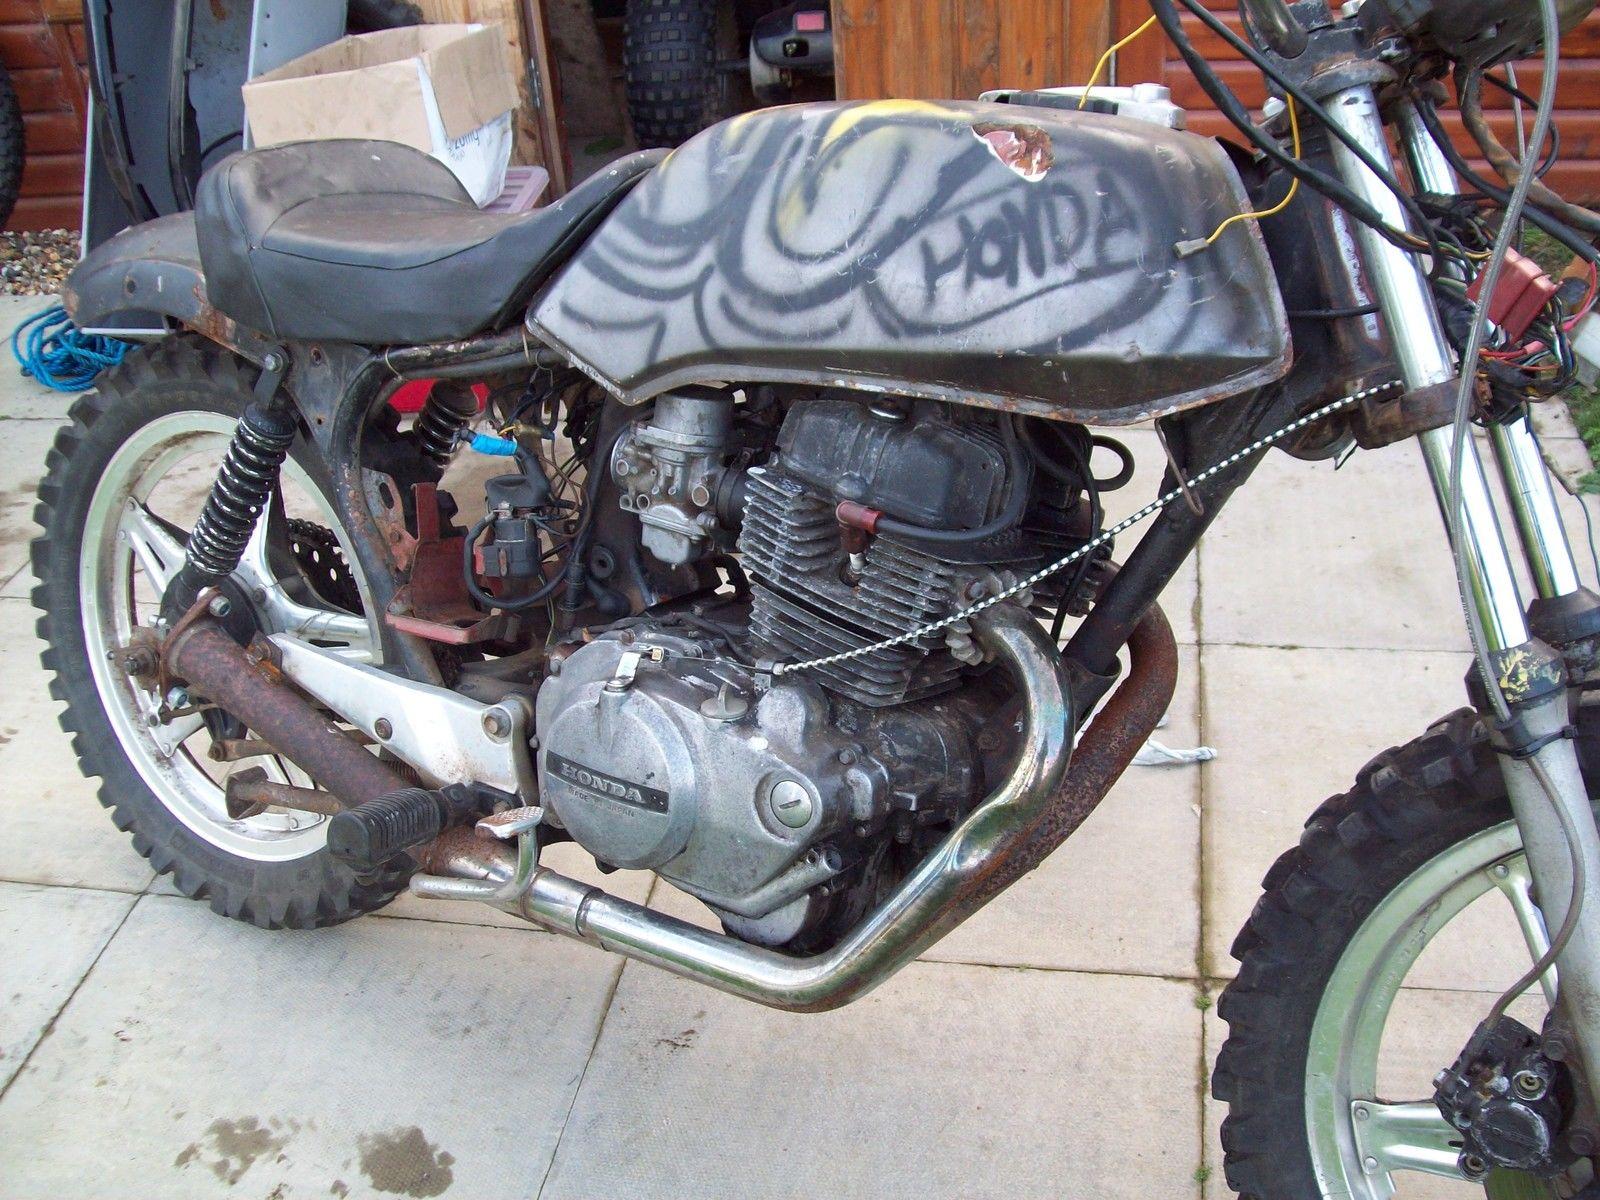 Honda 250 Superdream T Reg Ratbike Street Scrambler Field Bike Project  Flattrack